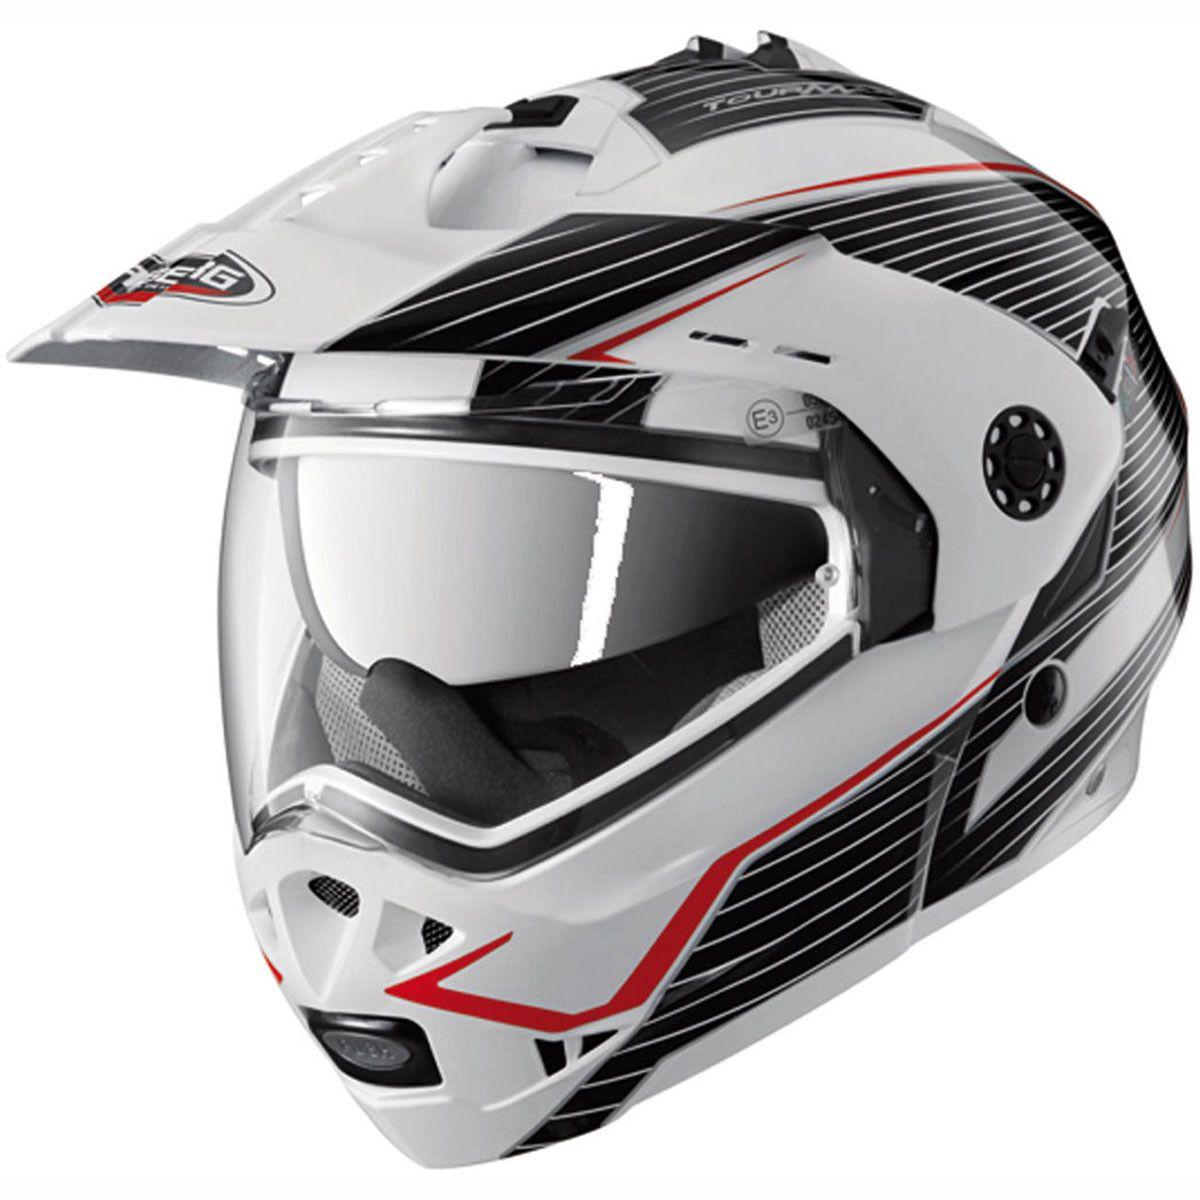 Caberg Tourmax Helmet in Black/Red Adventure touring